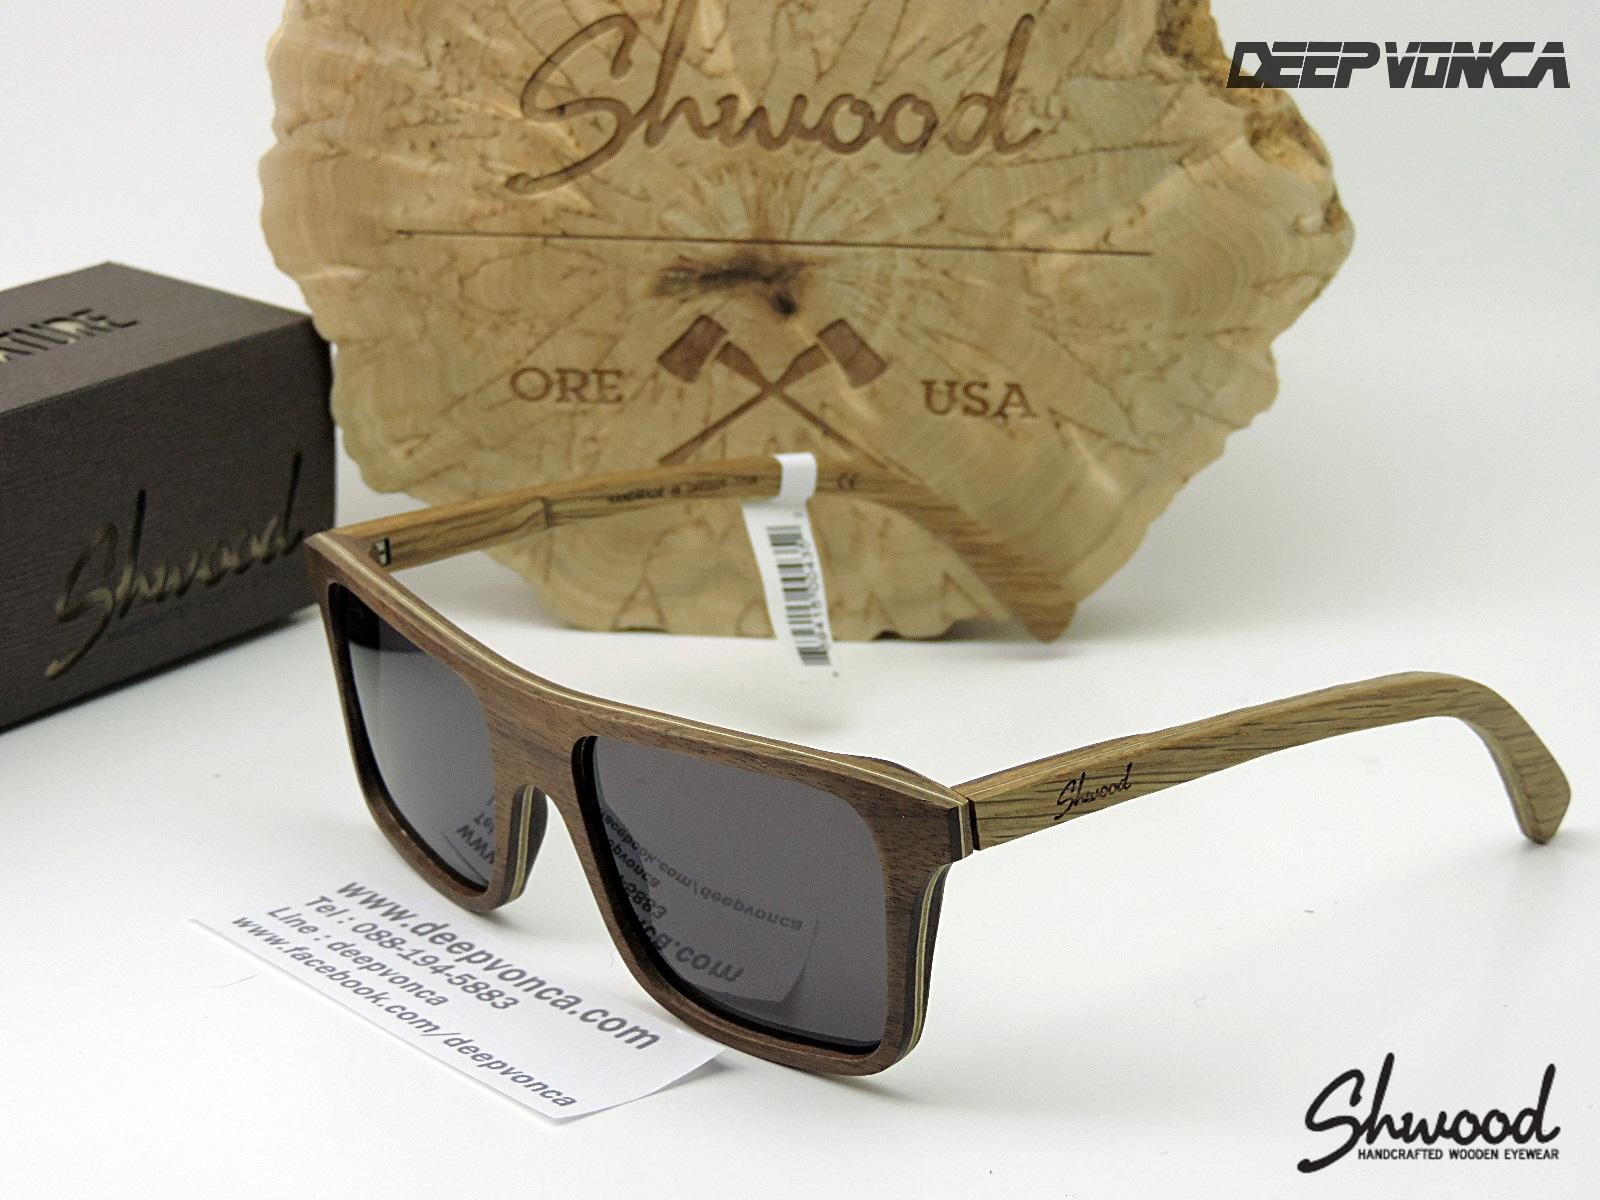 69a3ea49c1 Shwood Govy Walnut Oak - แว่นกันแดด Oakley ของแท้ ประกันศูนย์ ถูก ...